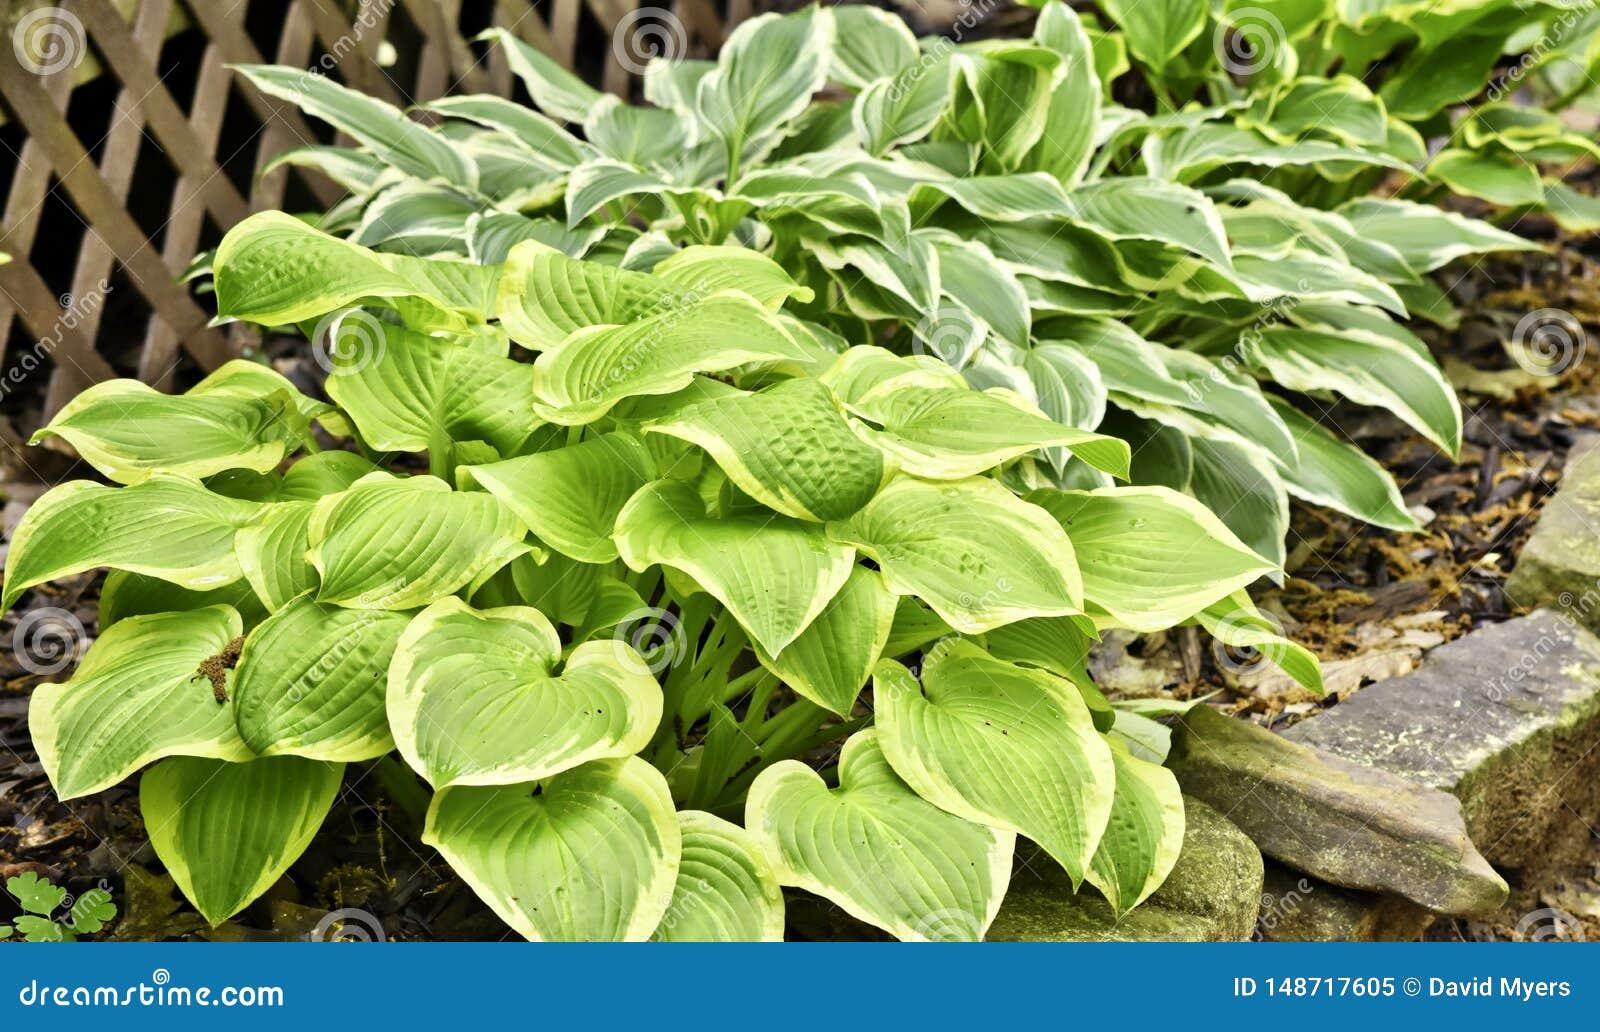 Vegetation Hostas Variegated Shade Tolerant Stock Image Image